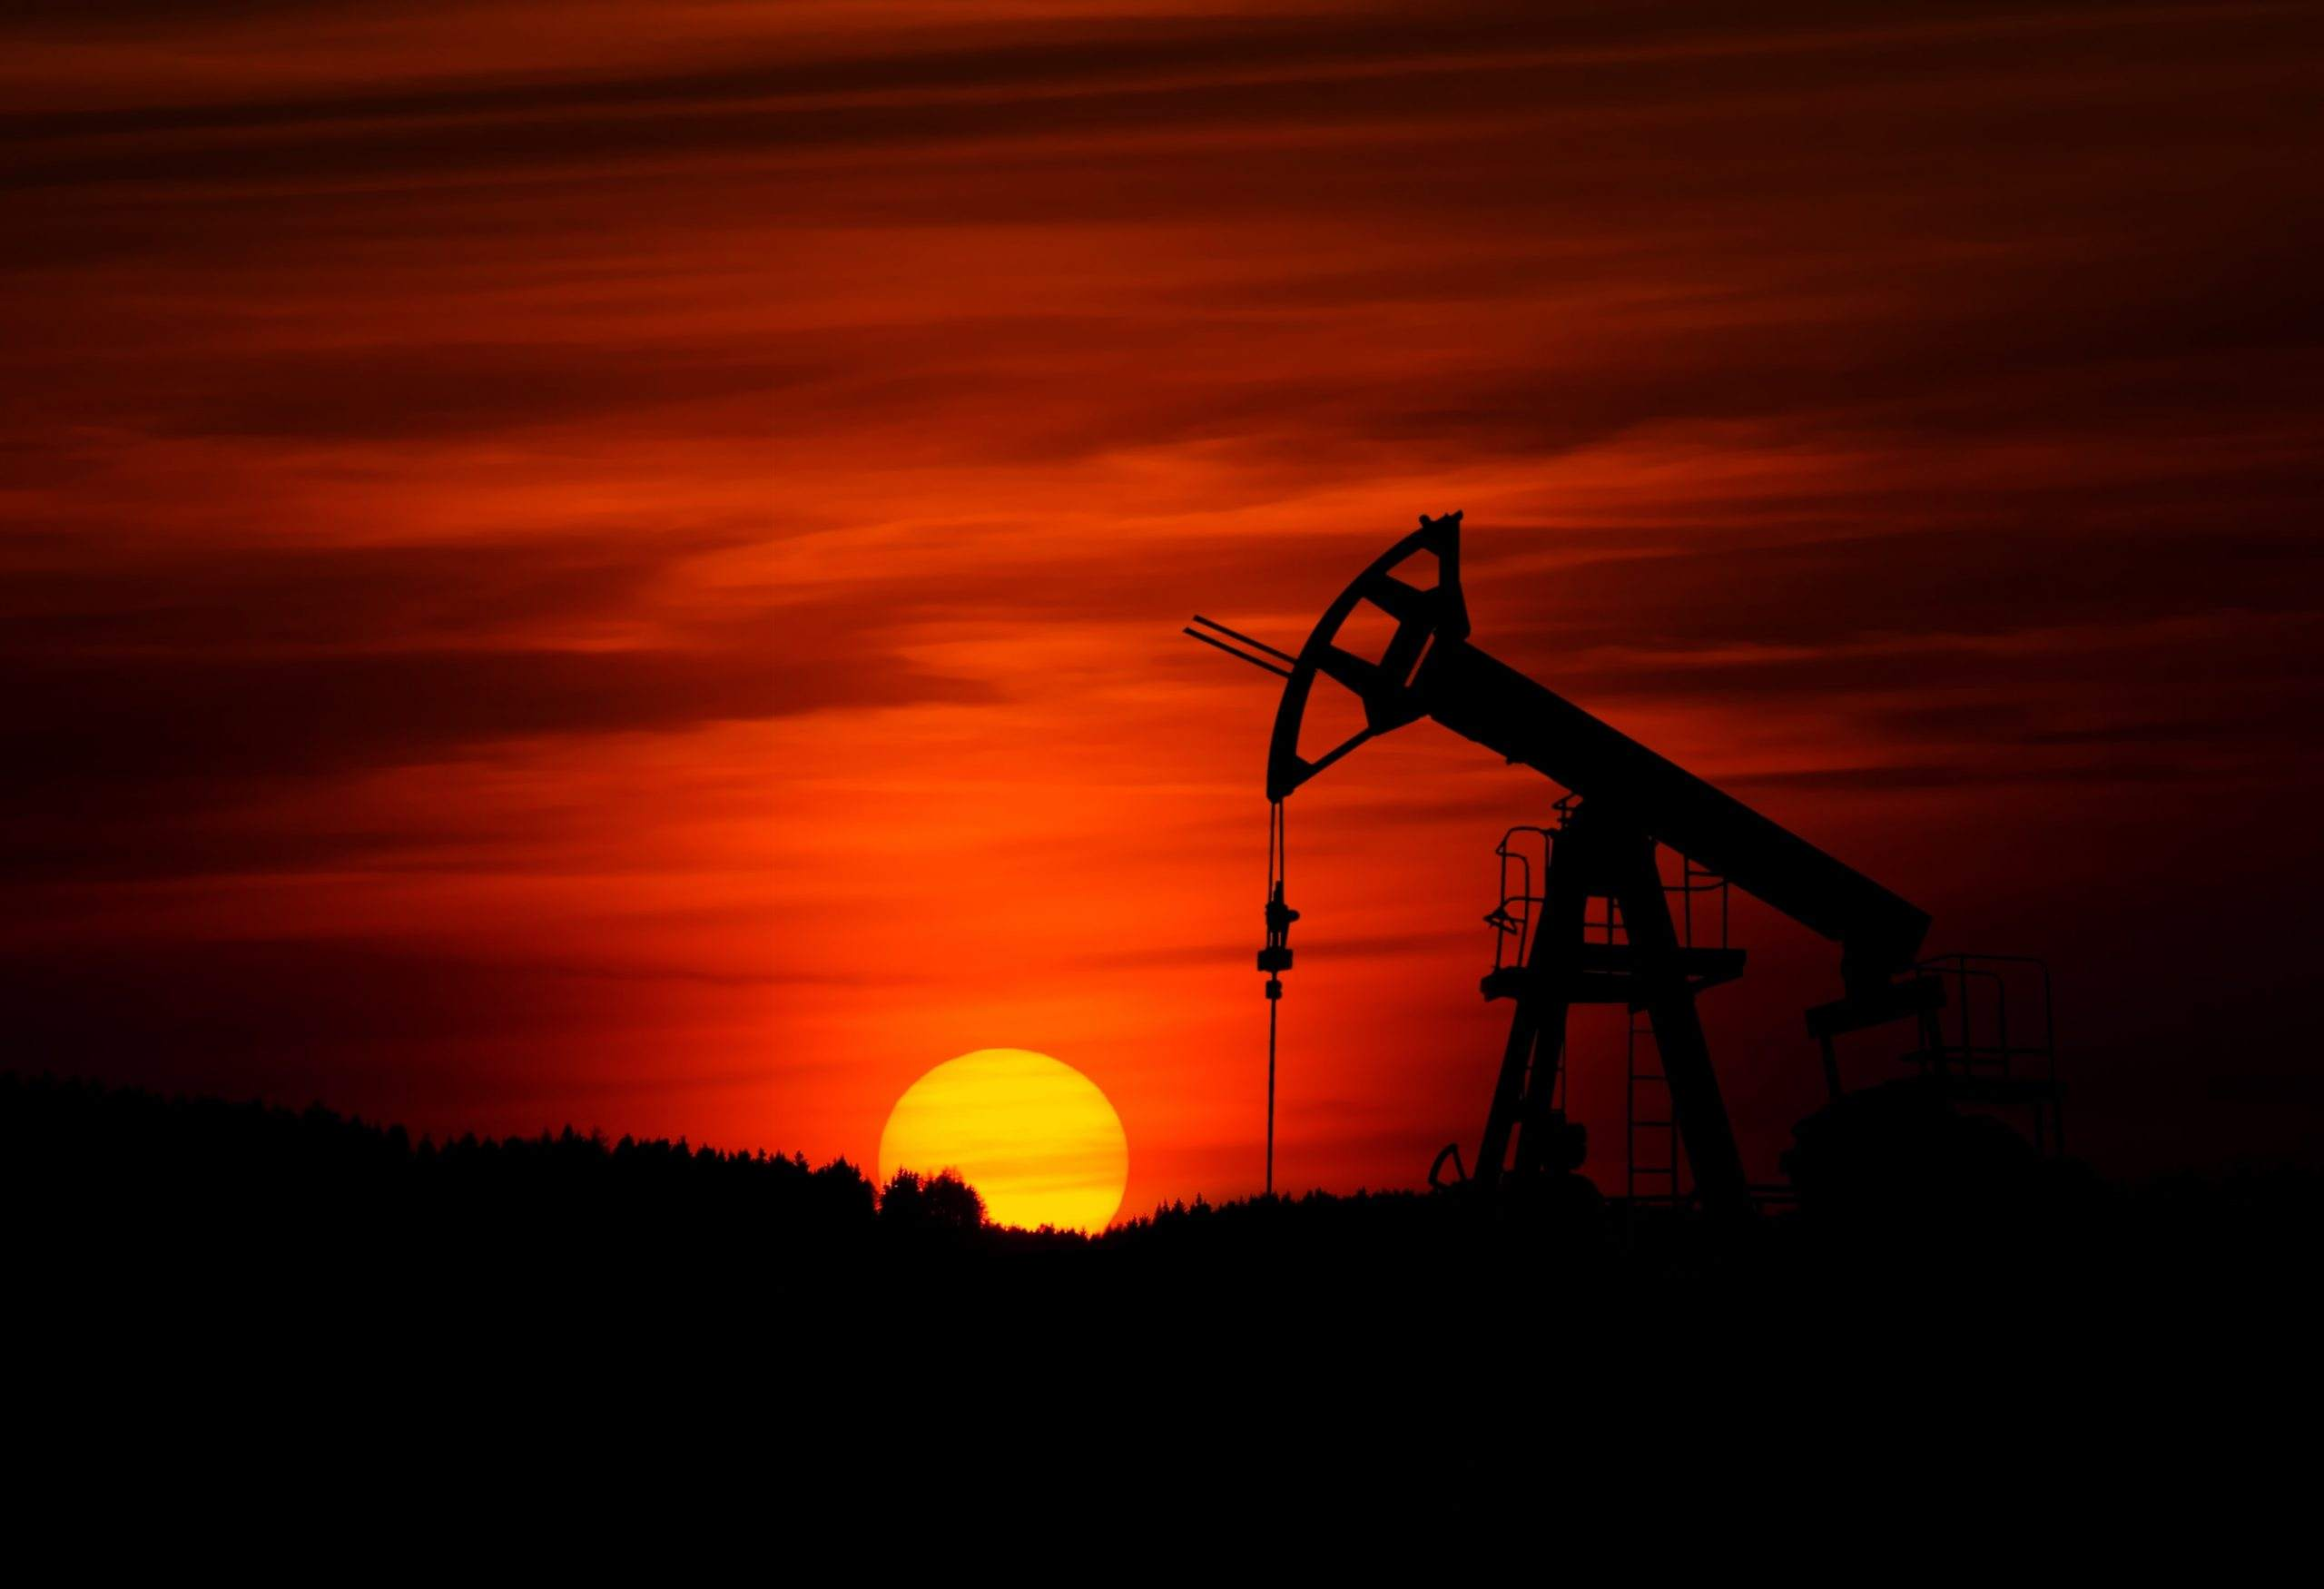 Ölpumpe vor Sonnenuntergang - Symbolfoto